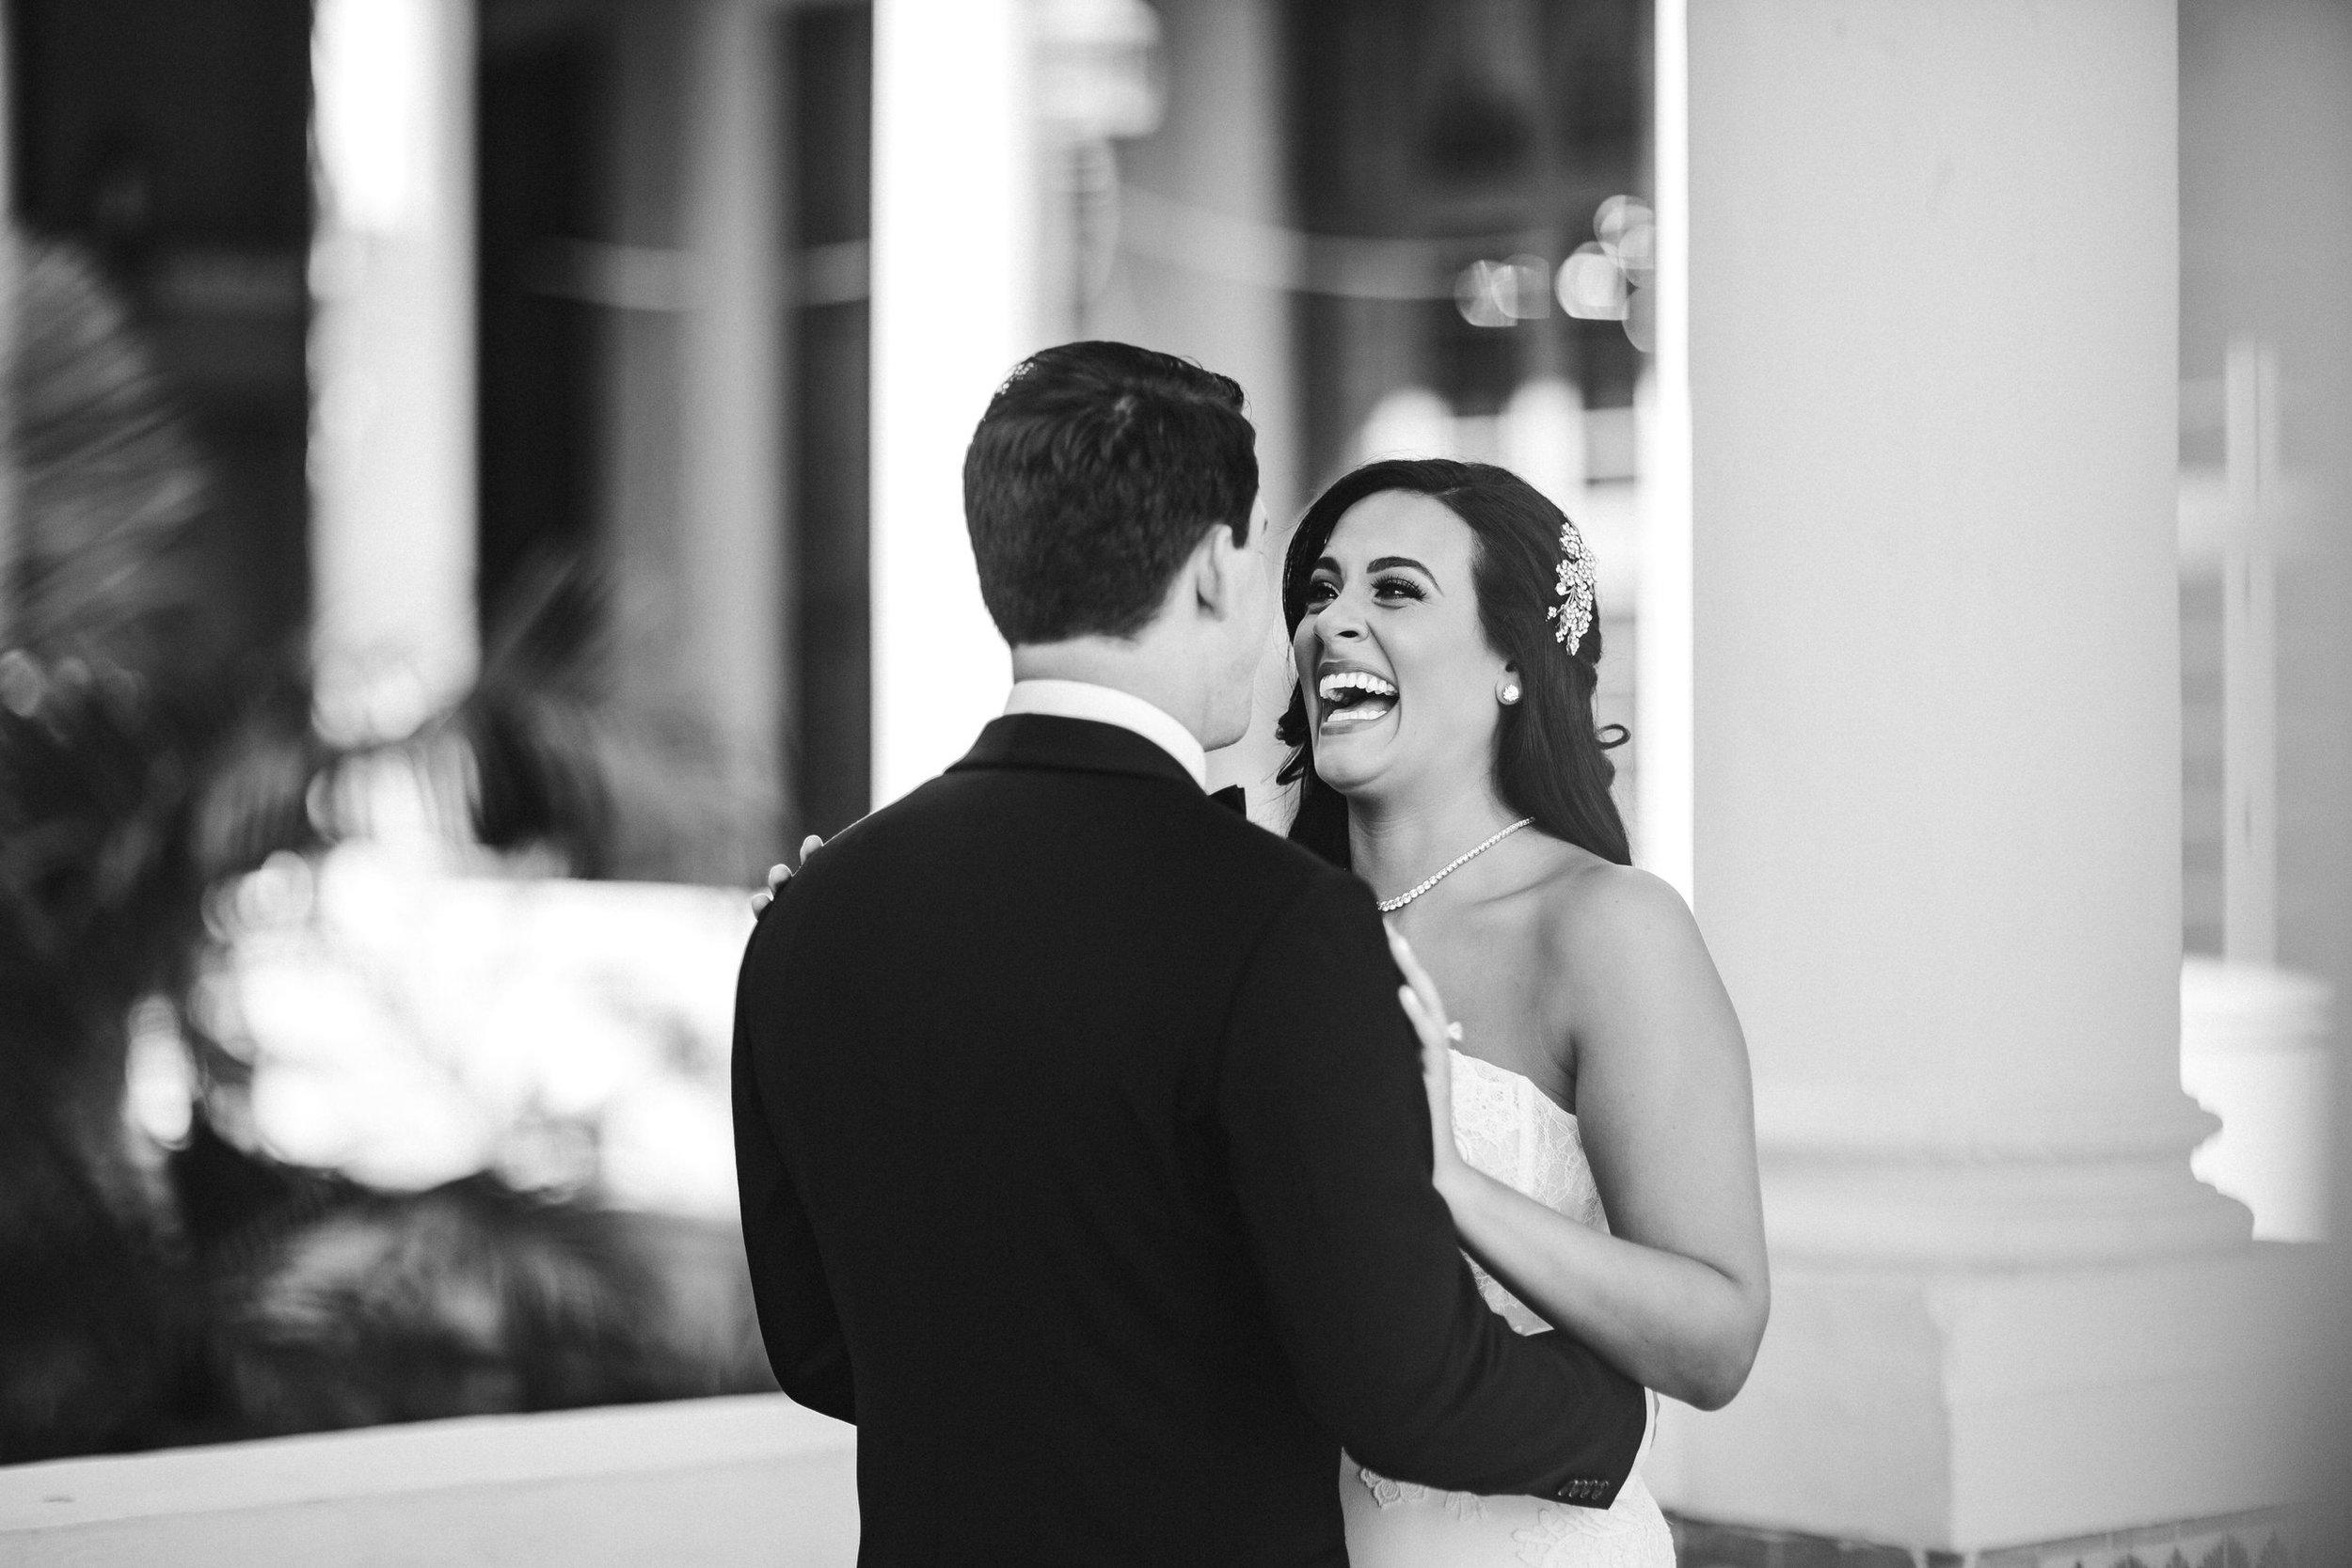 biltmore-wedding-steph-lynn-photo-photographer-bride-and-groom-15.jpg